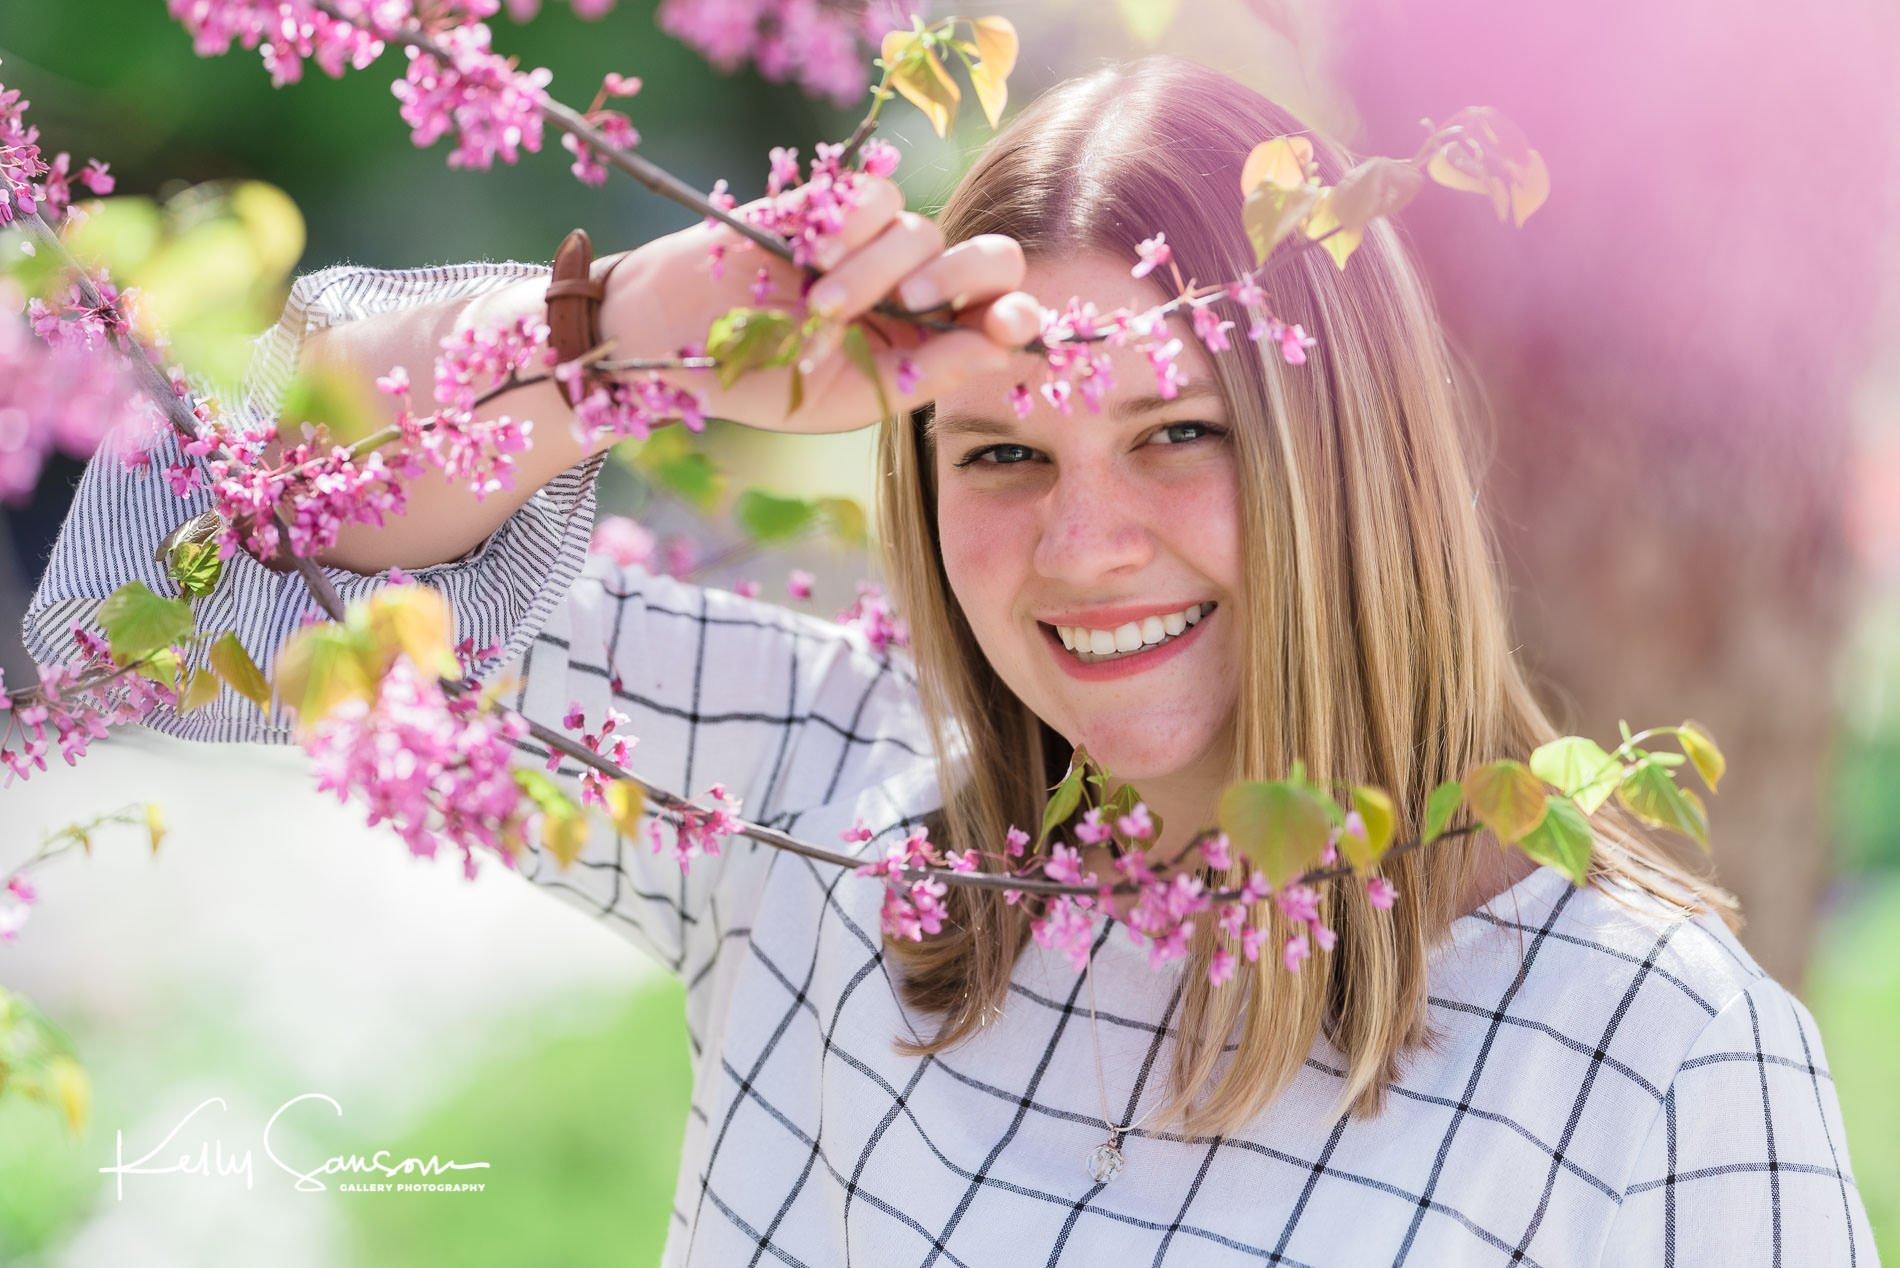 Abby Senior Photography on Main Street in Salt Lake City